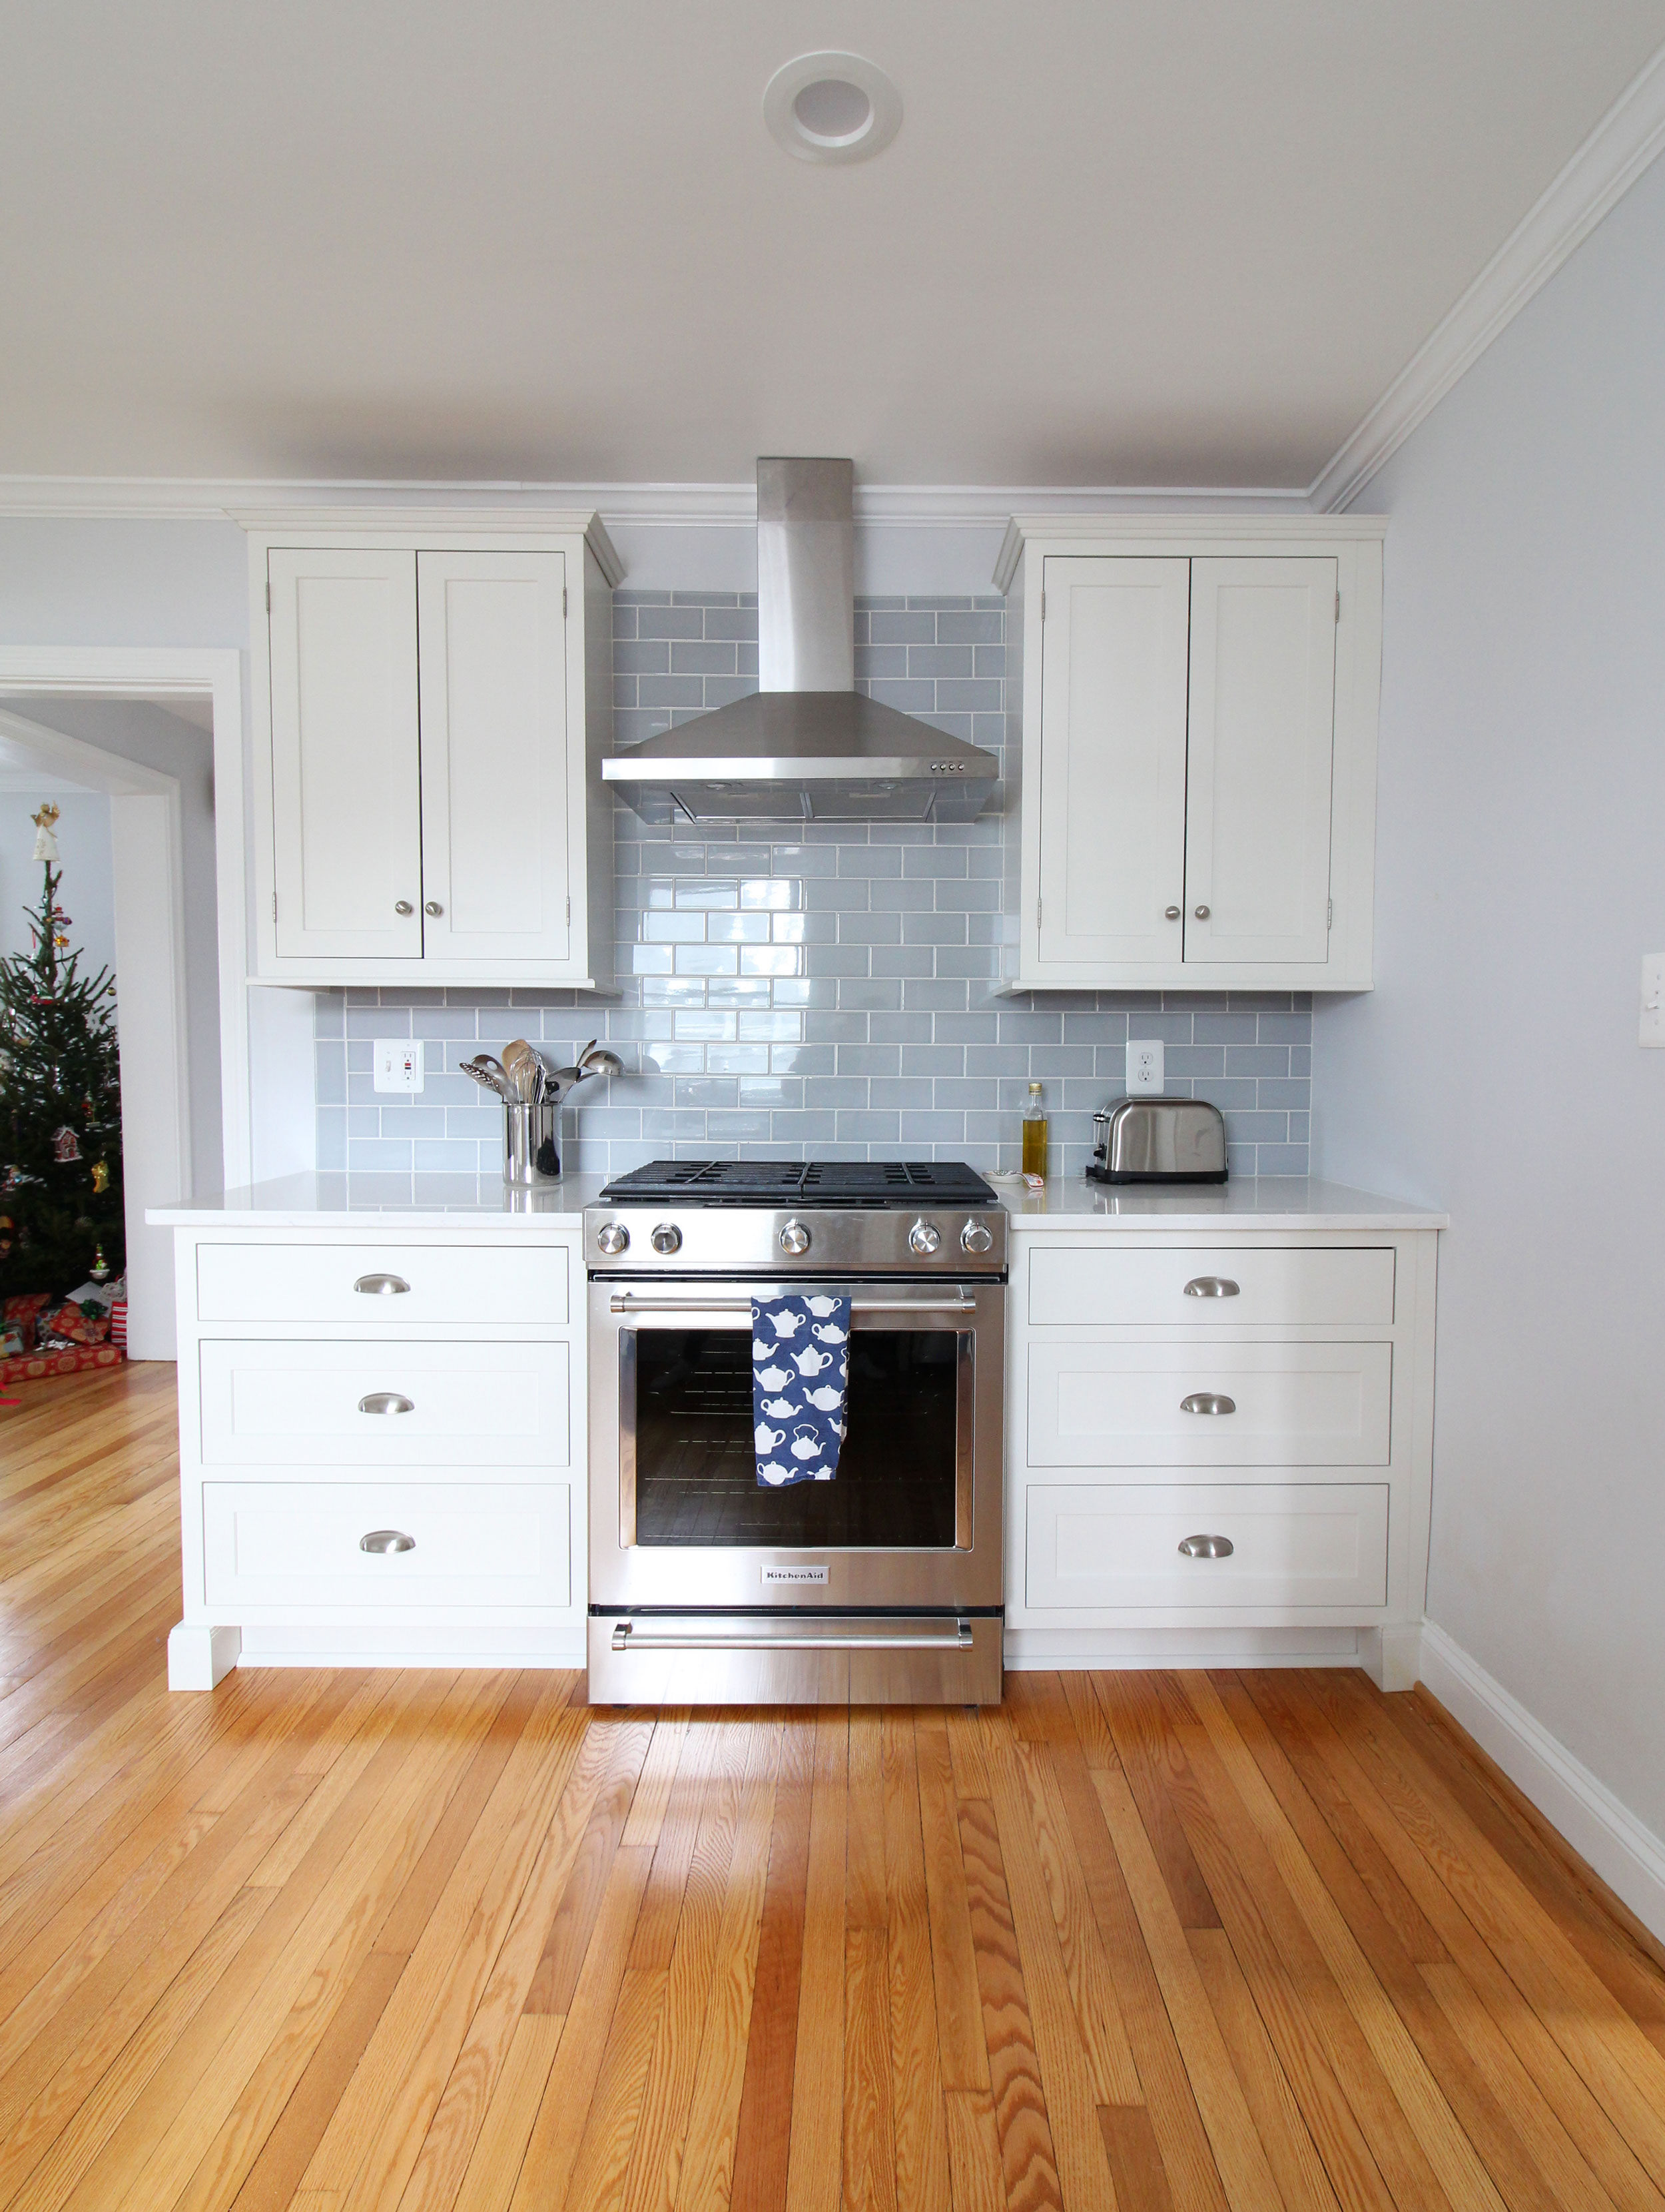 White-Inset-Cabinets-Blue-Tile-Transitional-Kitchen-1.jpg